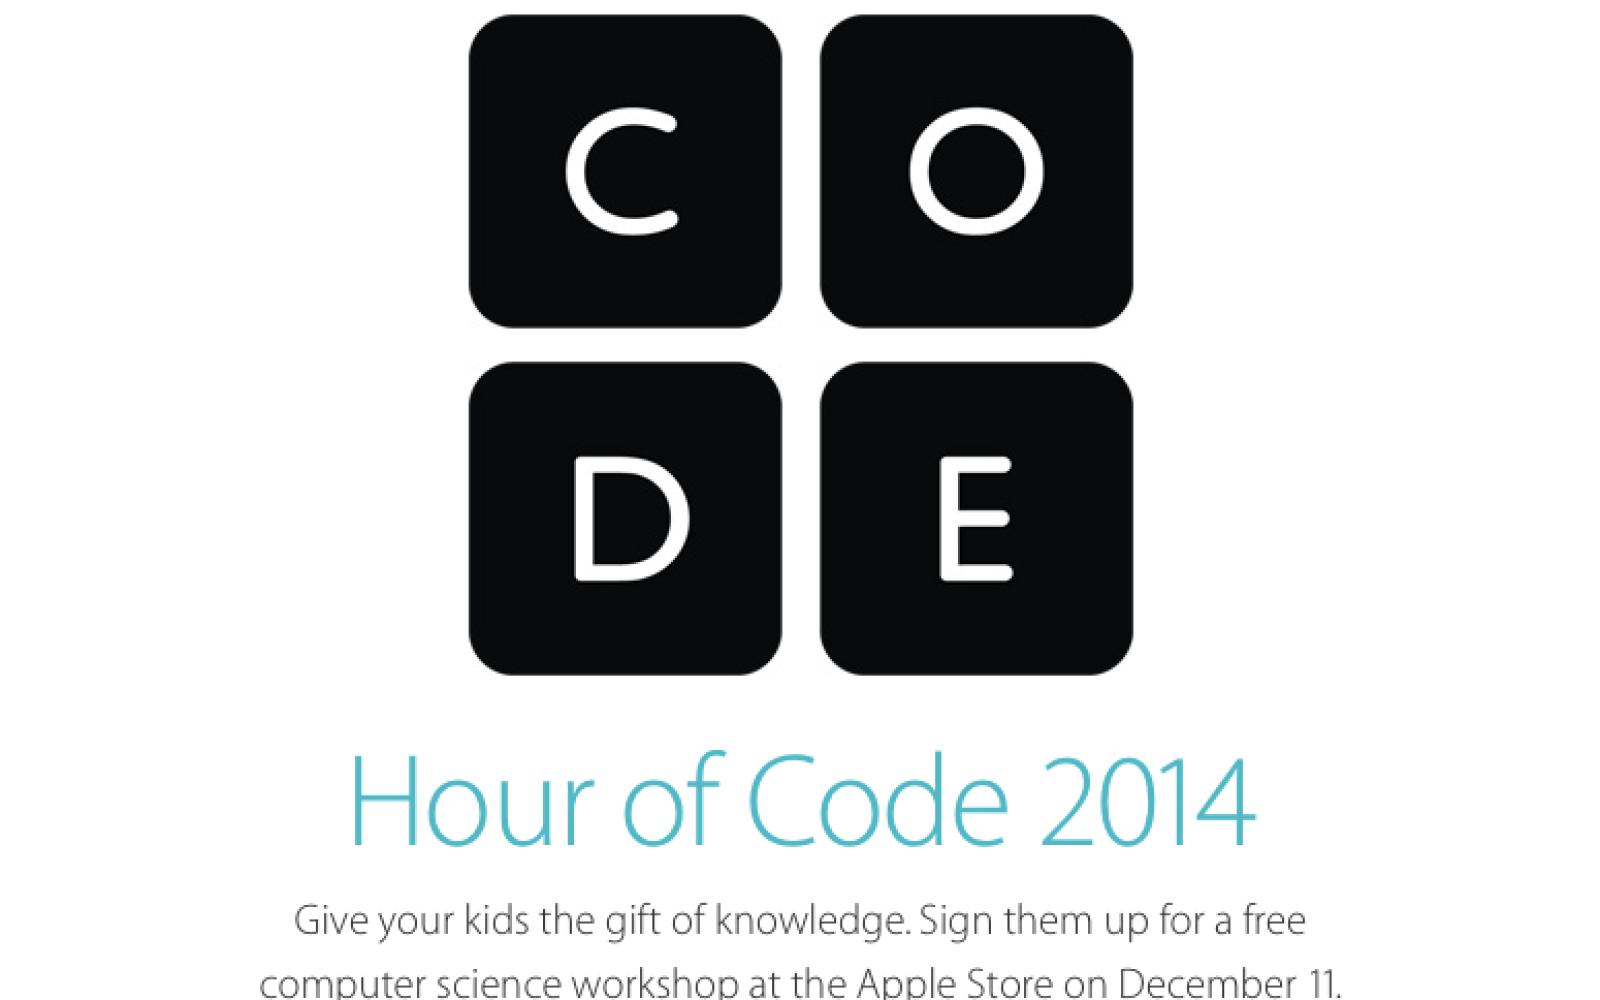 Apple Stores hosting Hour of Code programming workshops on December 11th